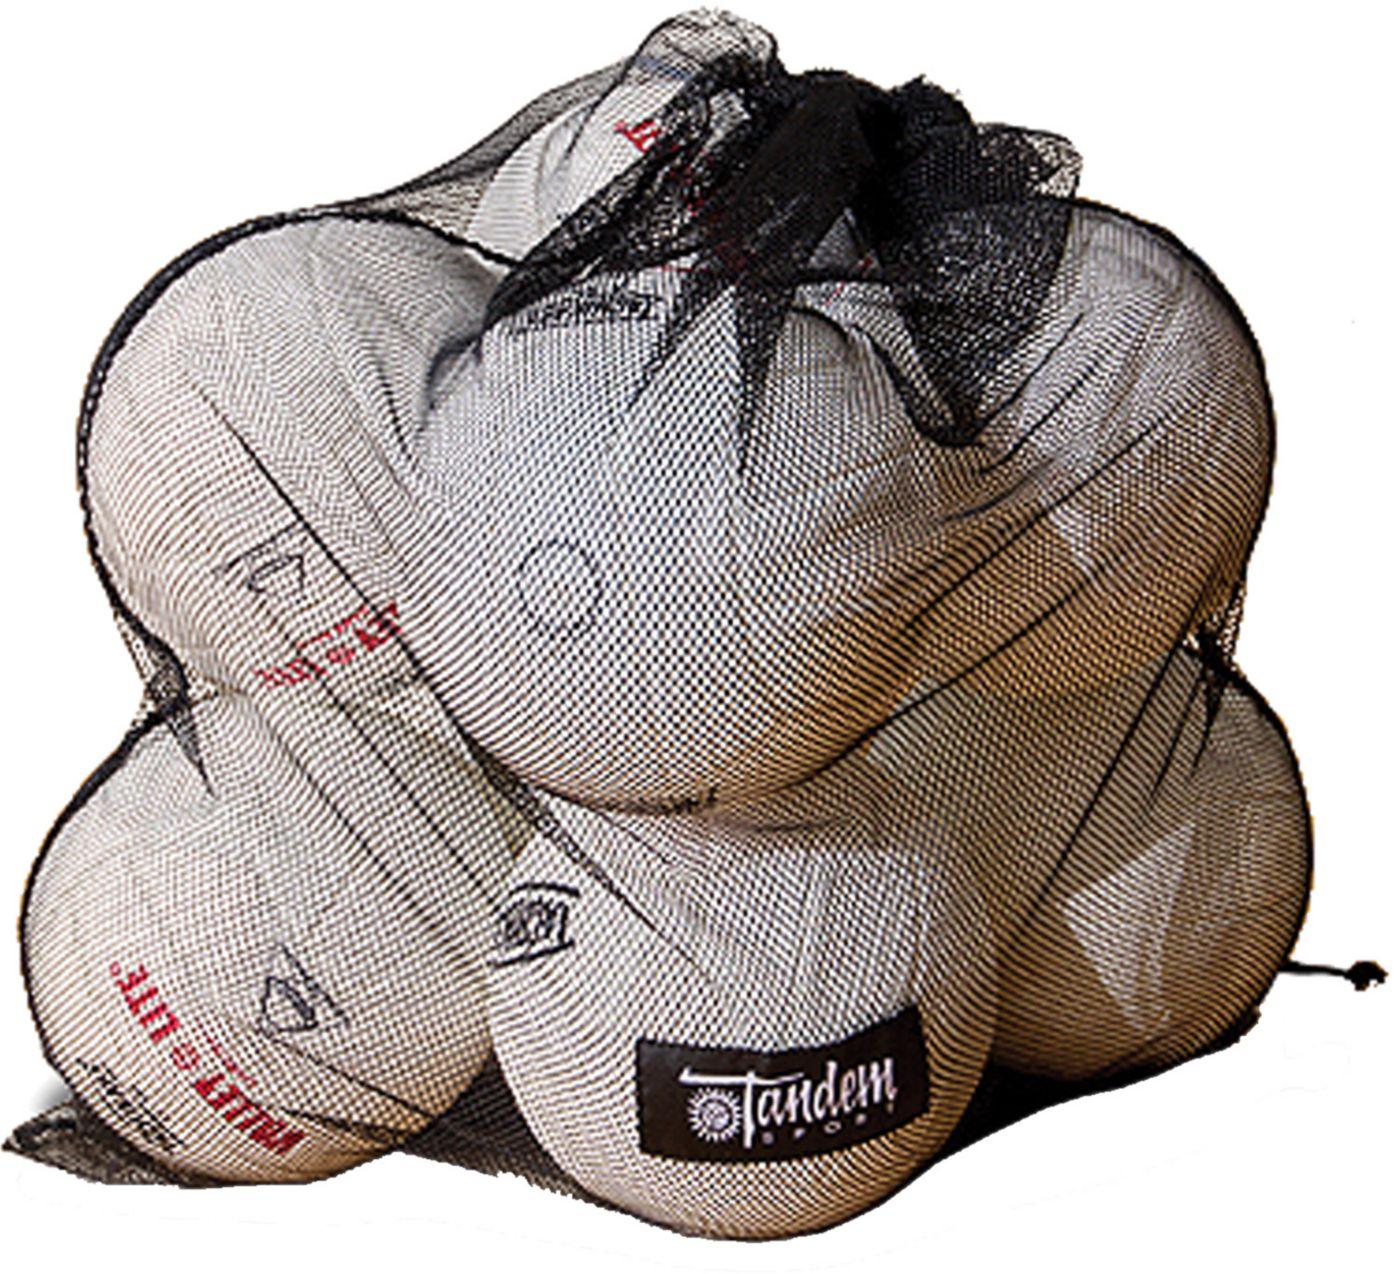 Tandem Volleyball Mesh Ball Bag